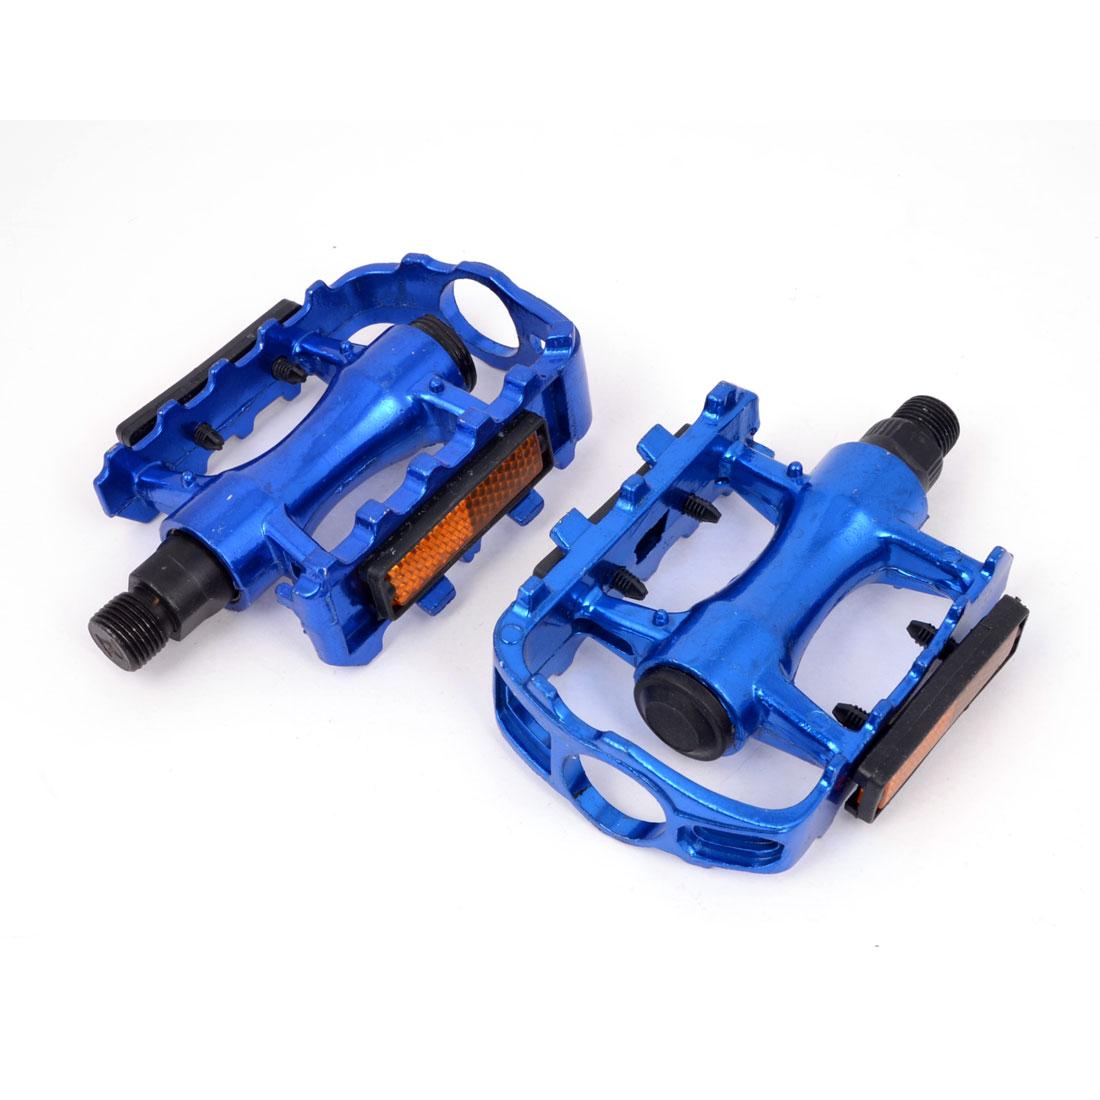 Mountain Road Bike Bicycle Blue Aluminium Platform Pedals 2pcs